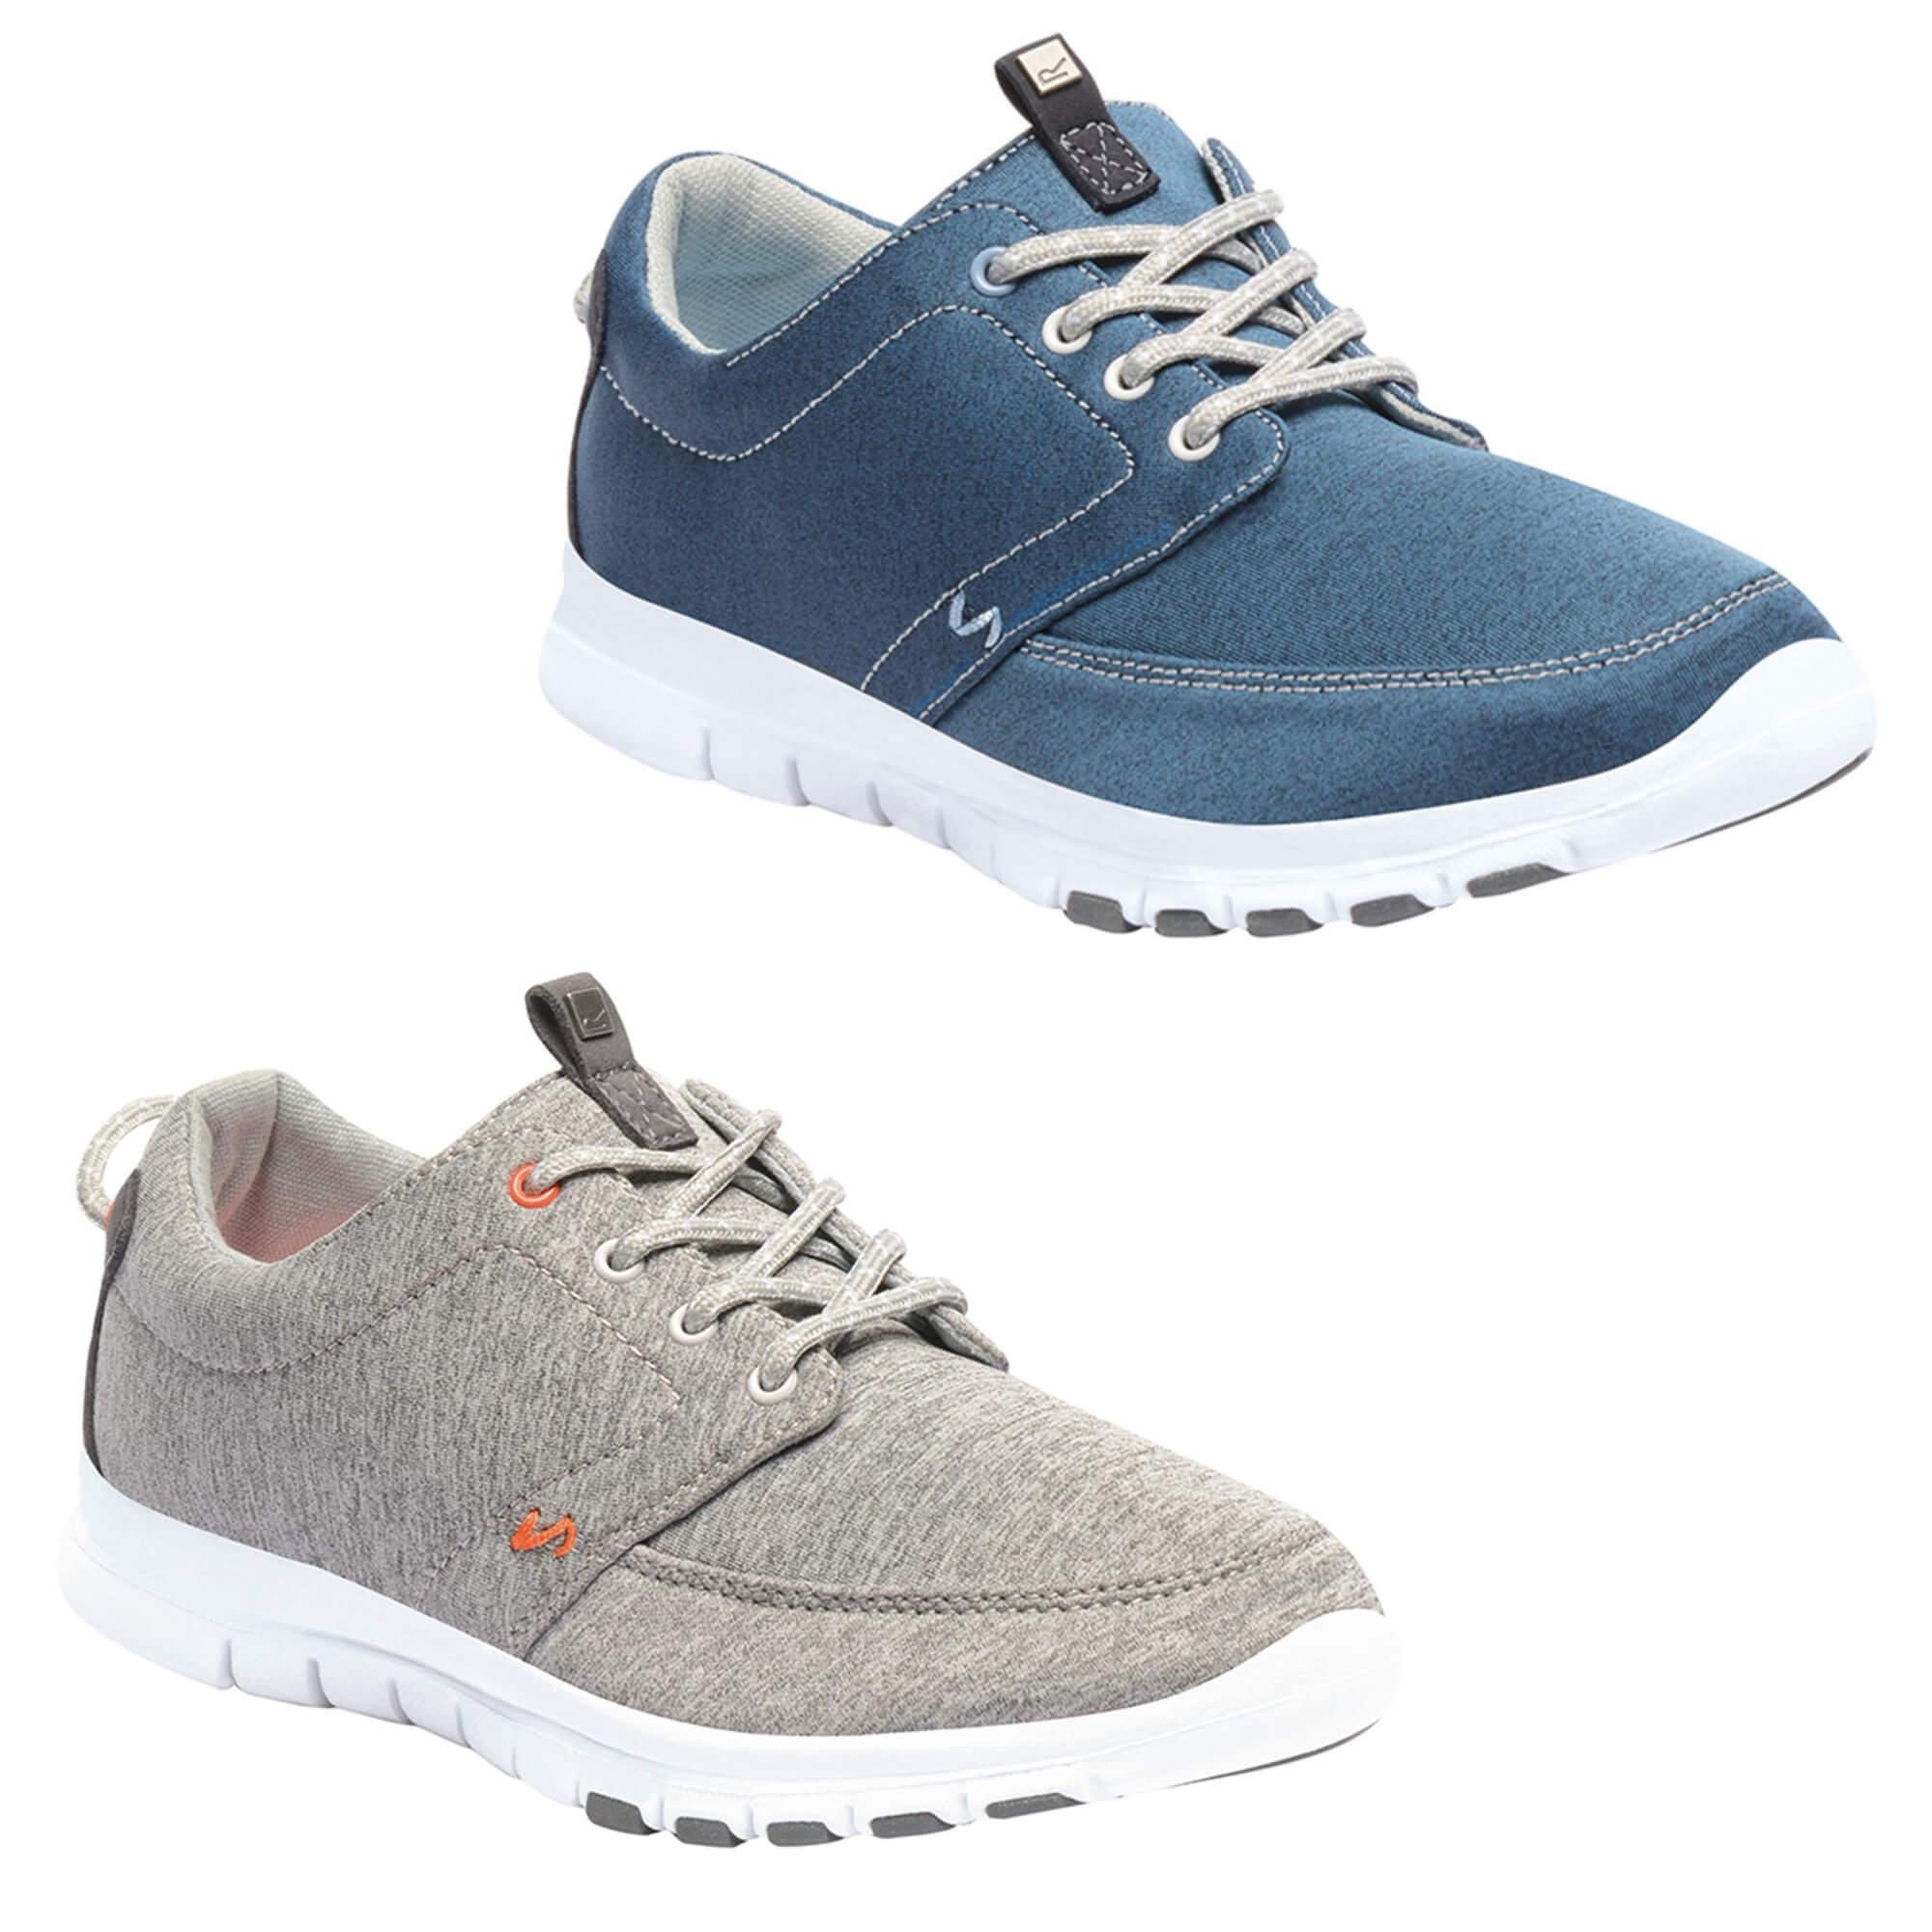 new styles 5cf59 21646 Regatta Damen Sneakers Lady Marine RWF482 | Vision sports Outdoor- &  Sportbekleidung